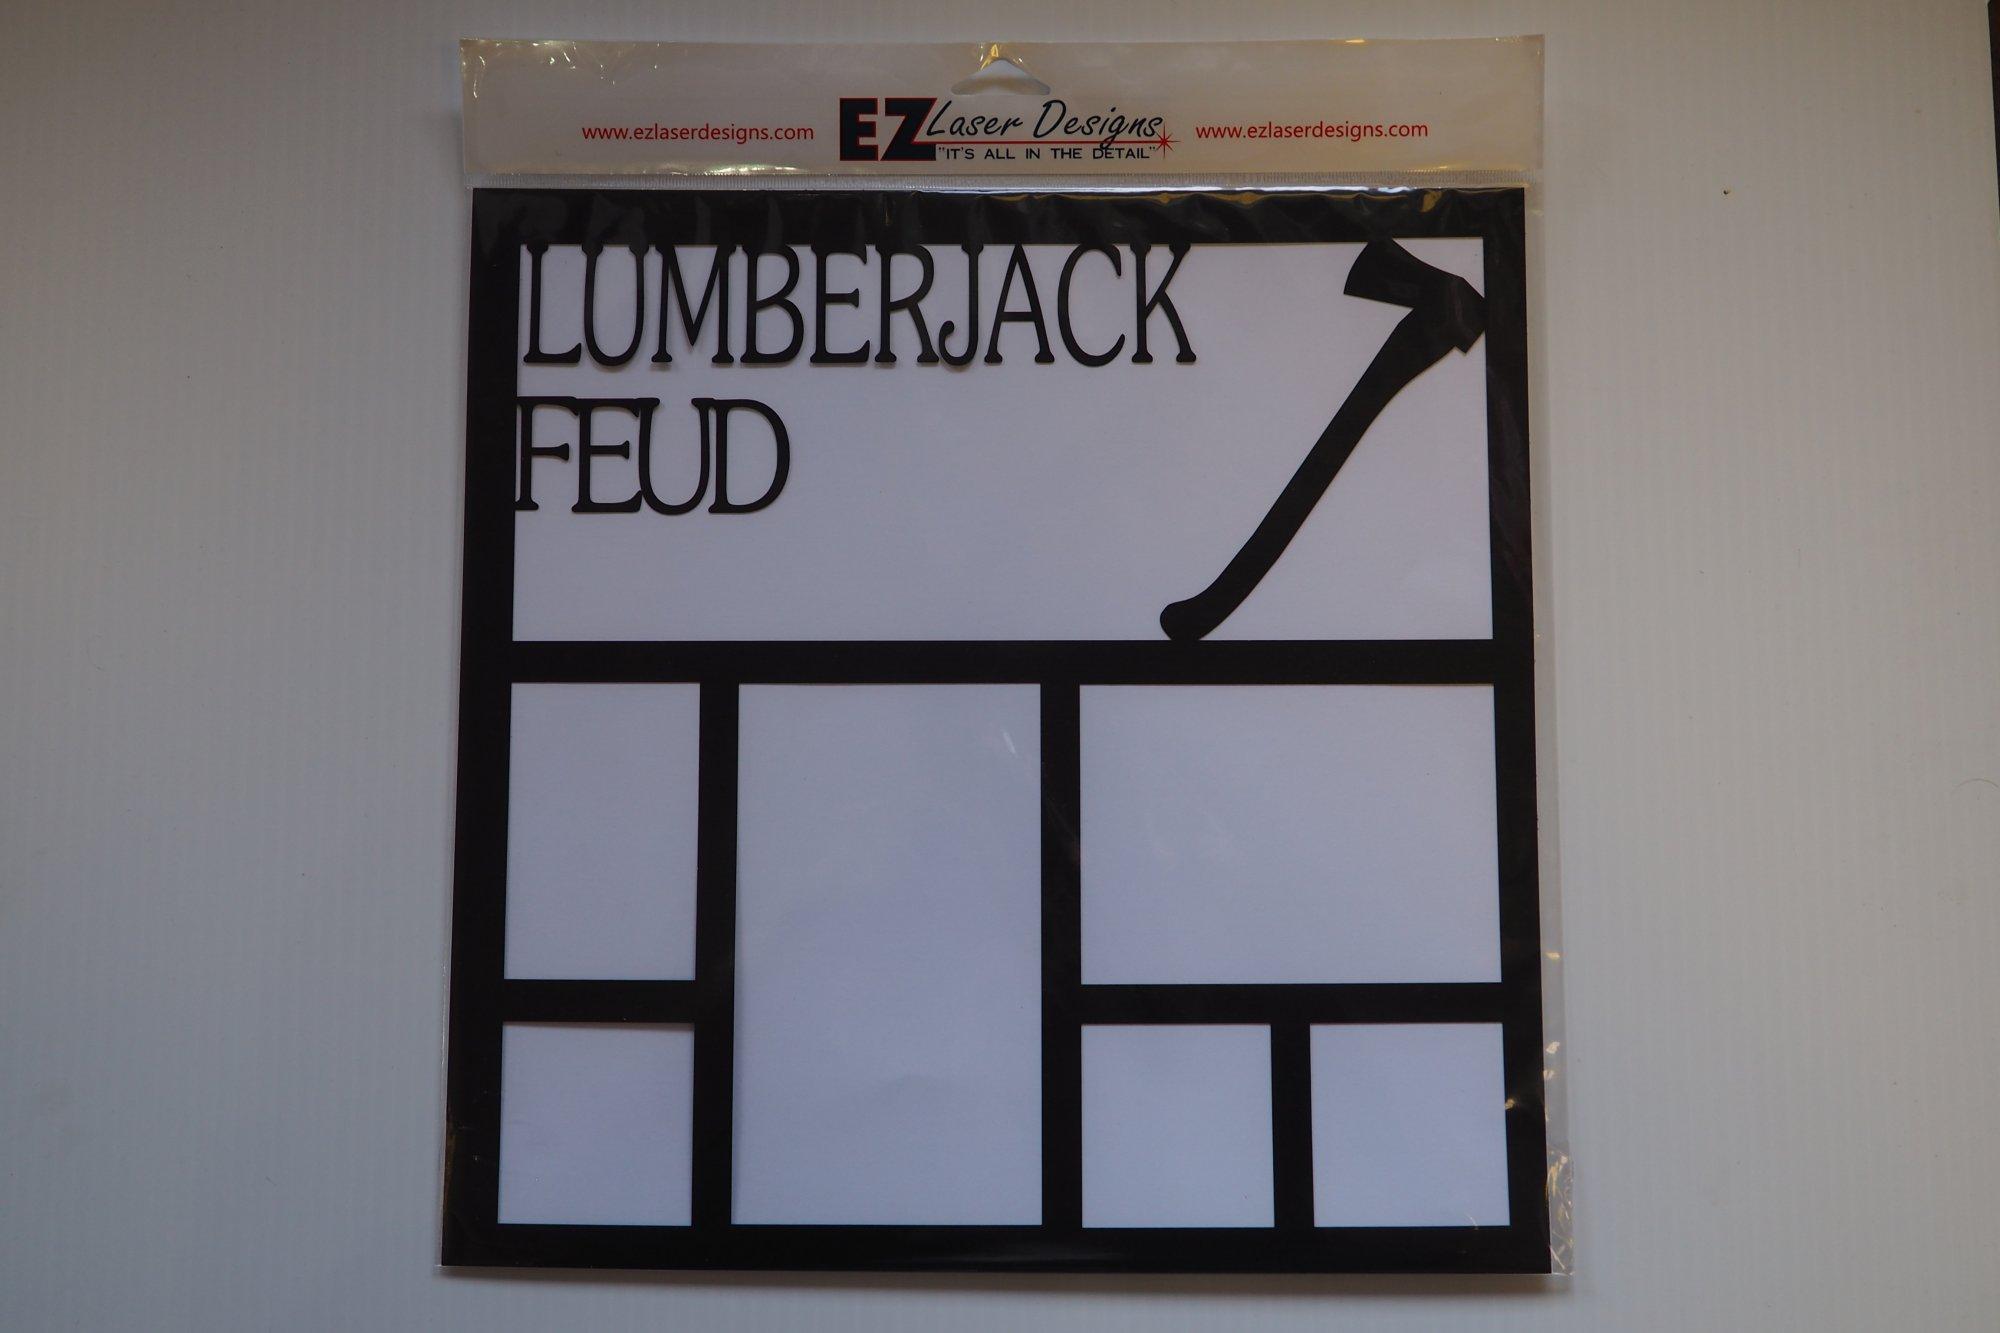 Lumberjack Feud 12x12 Overlay